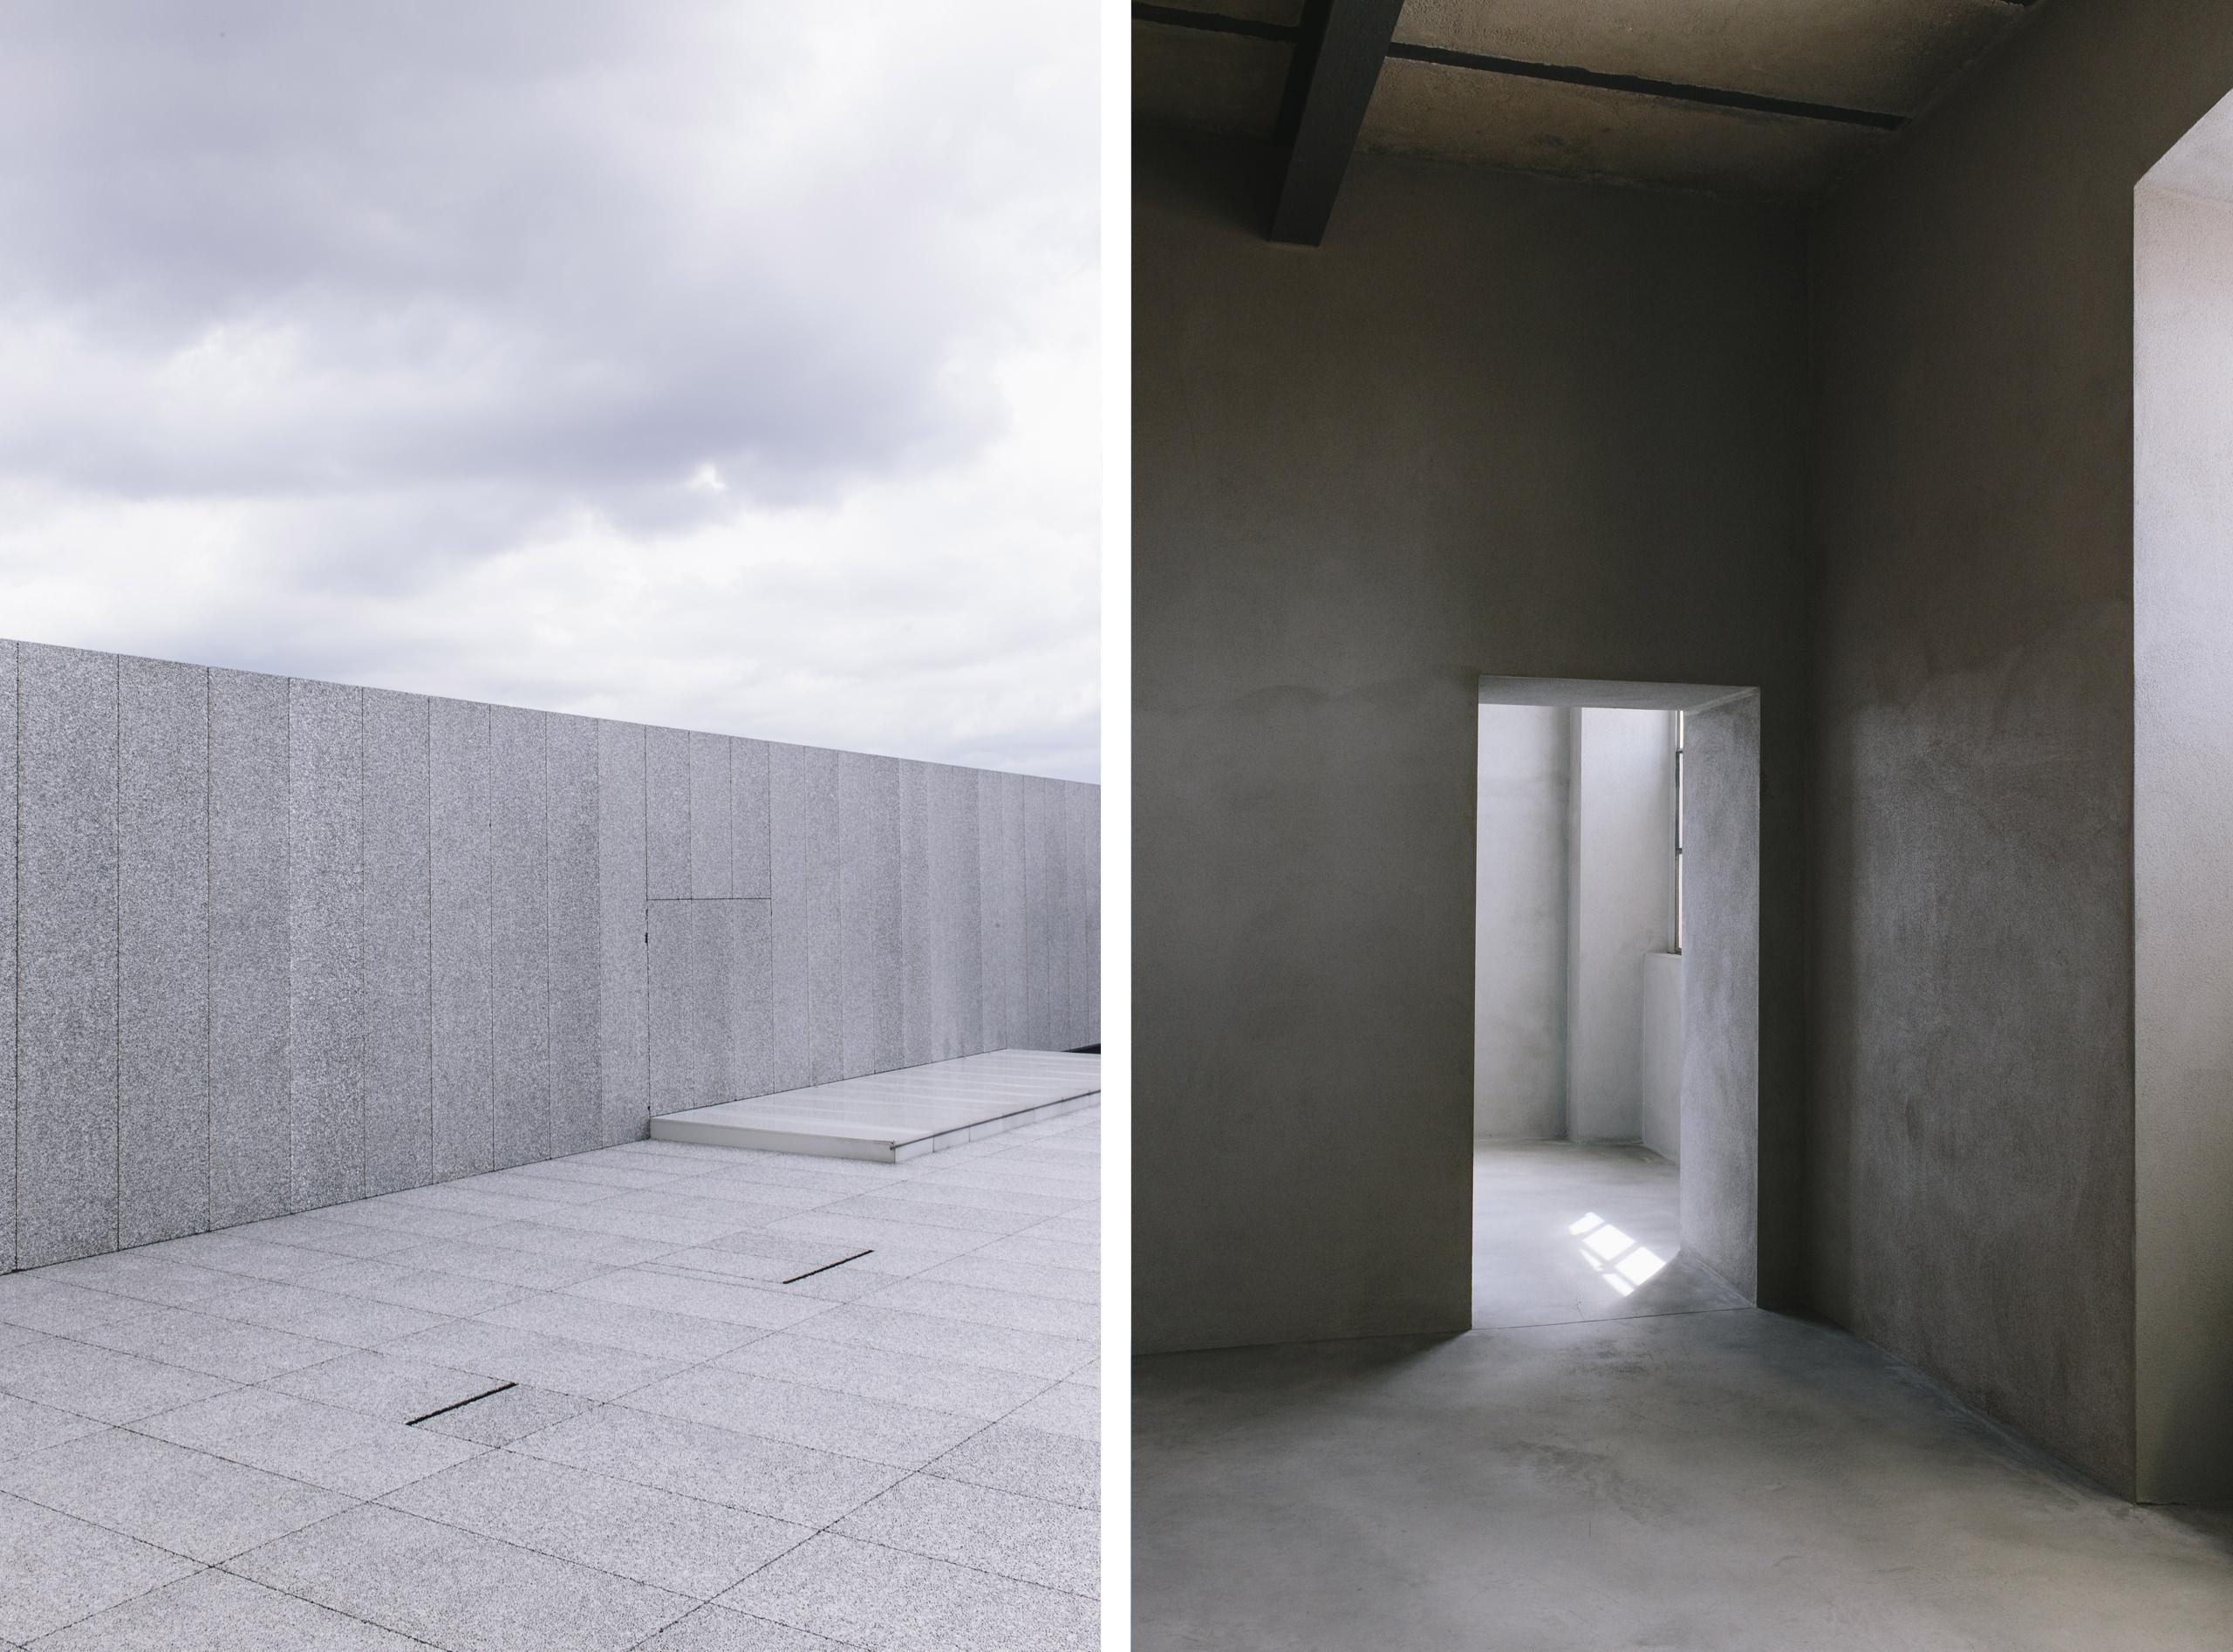 Fondazione-Prada-2